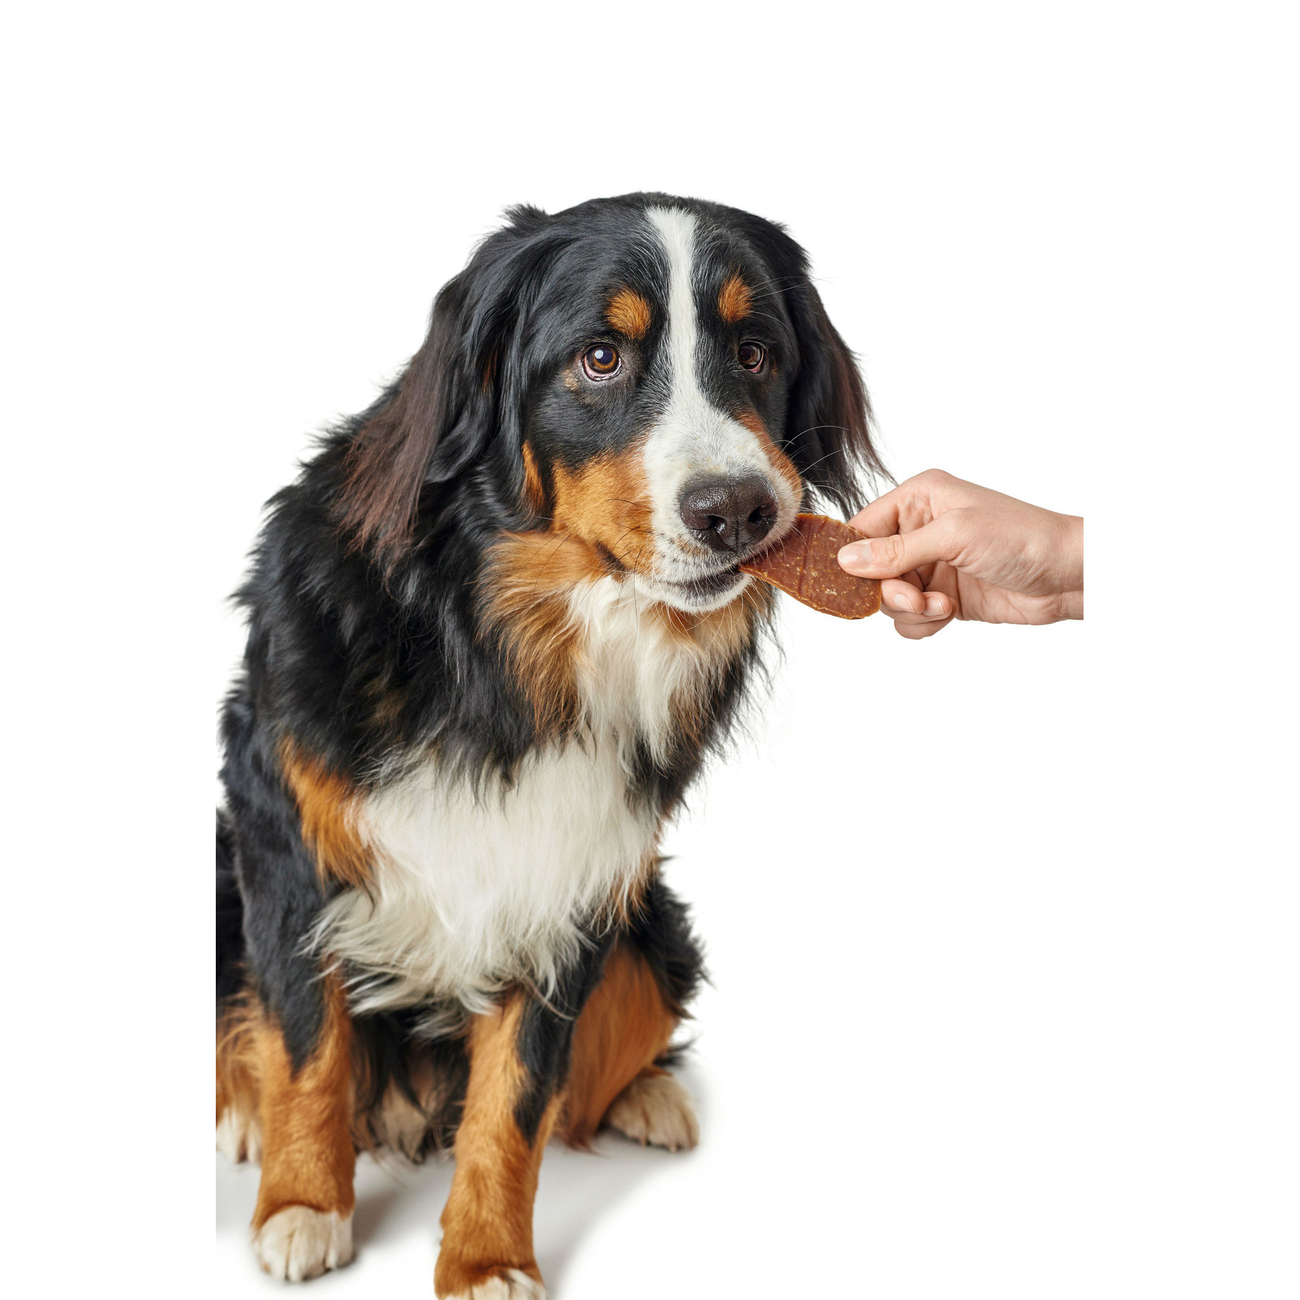 Hunter Hundesnack Maxis 65784, Bild 7